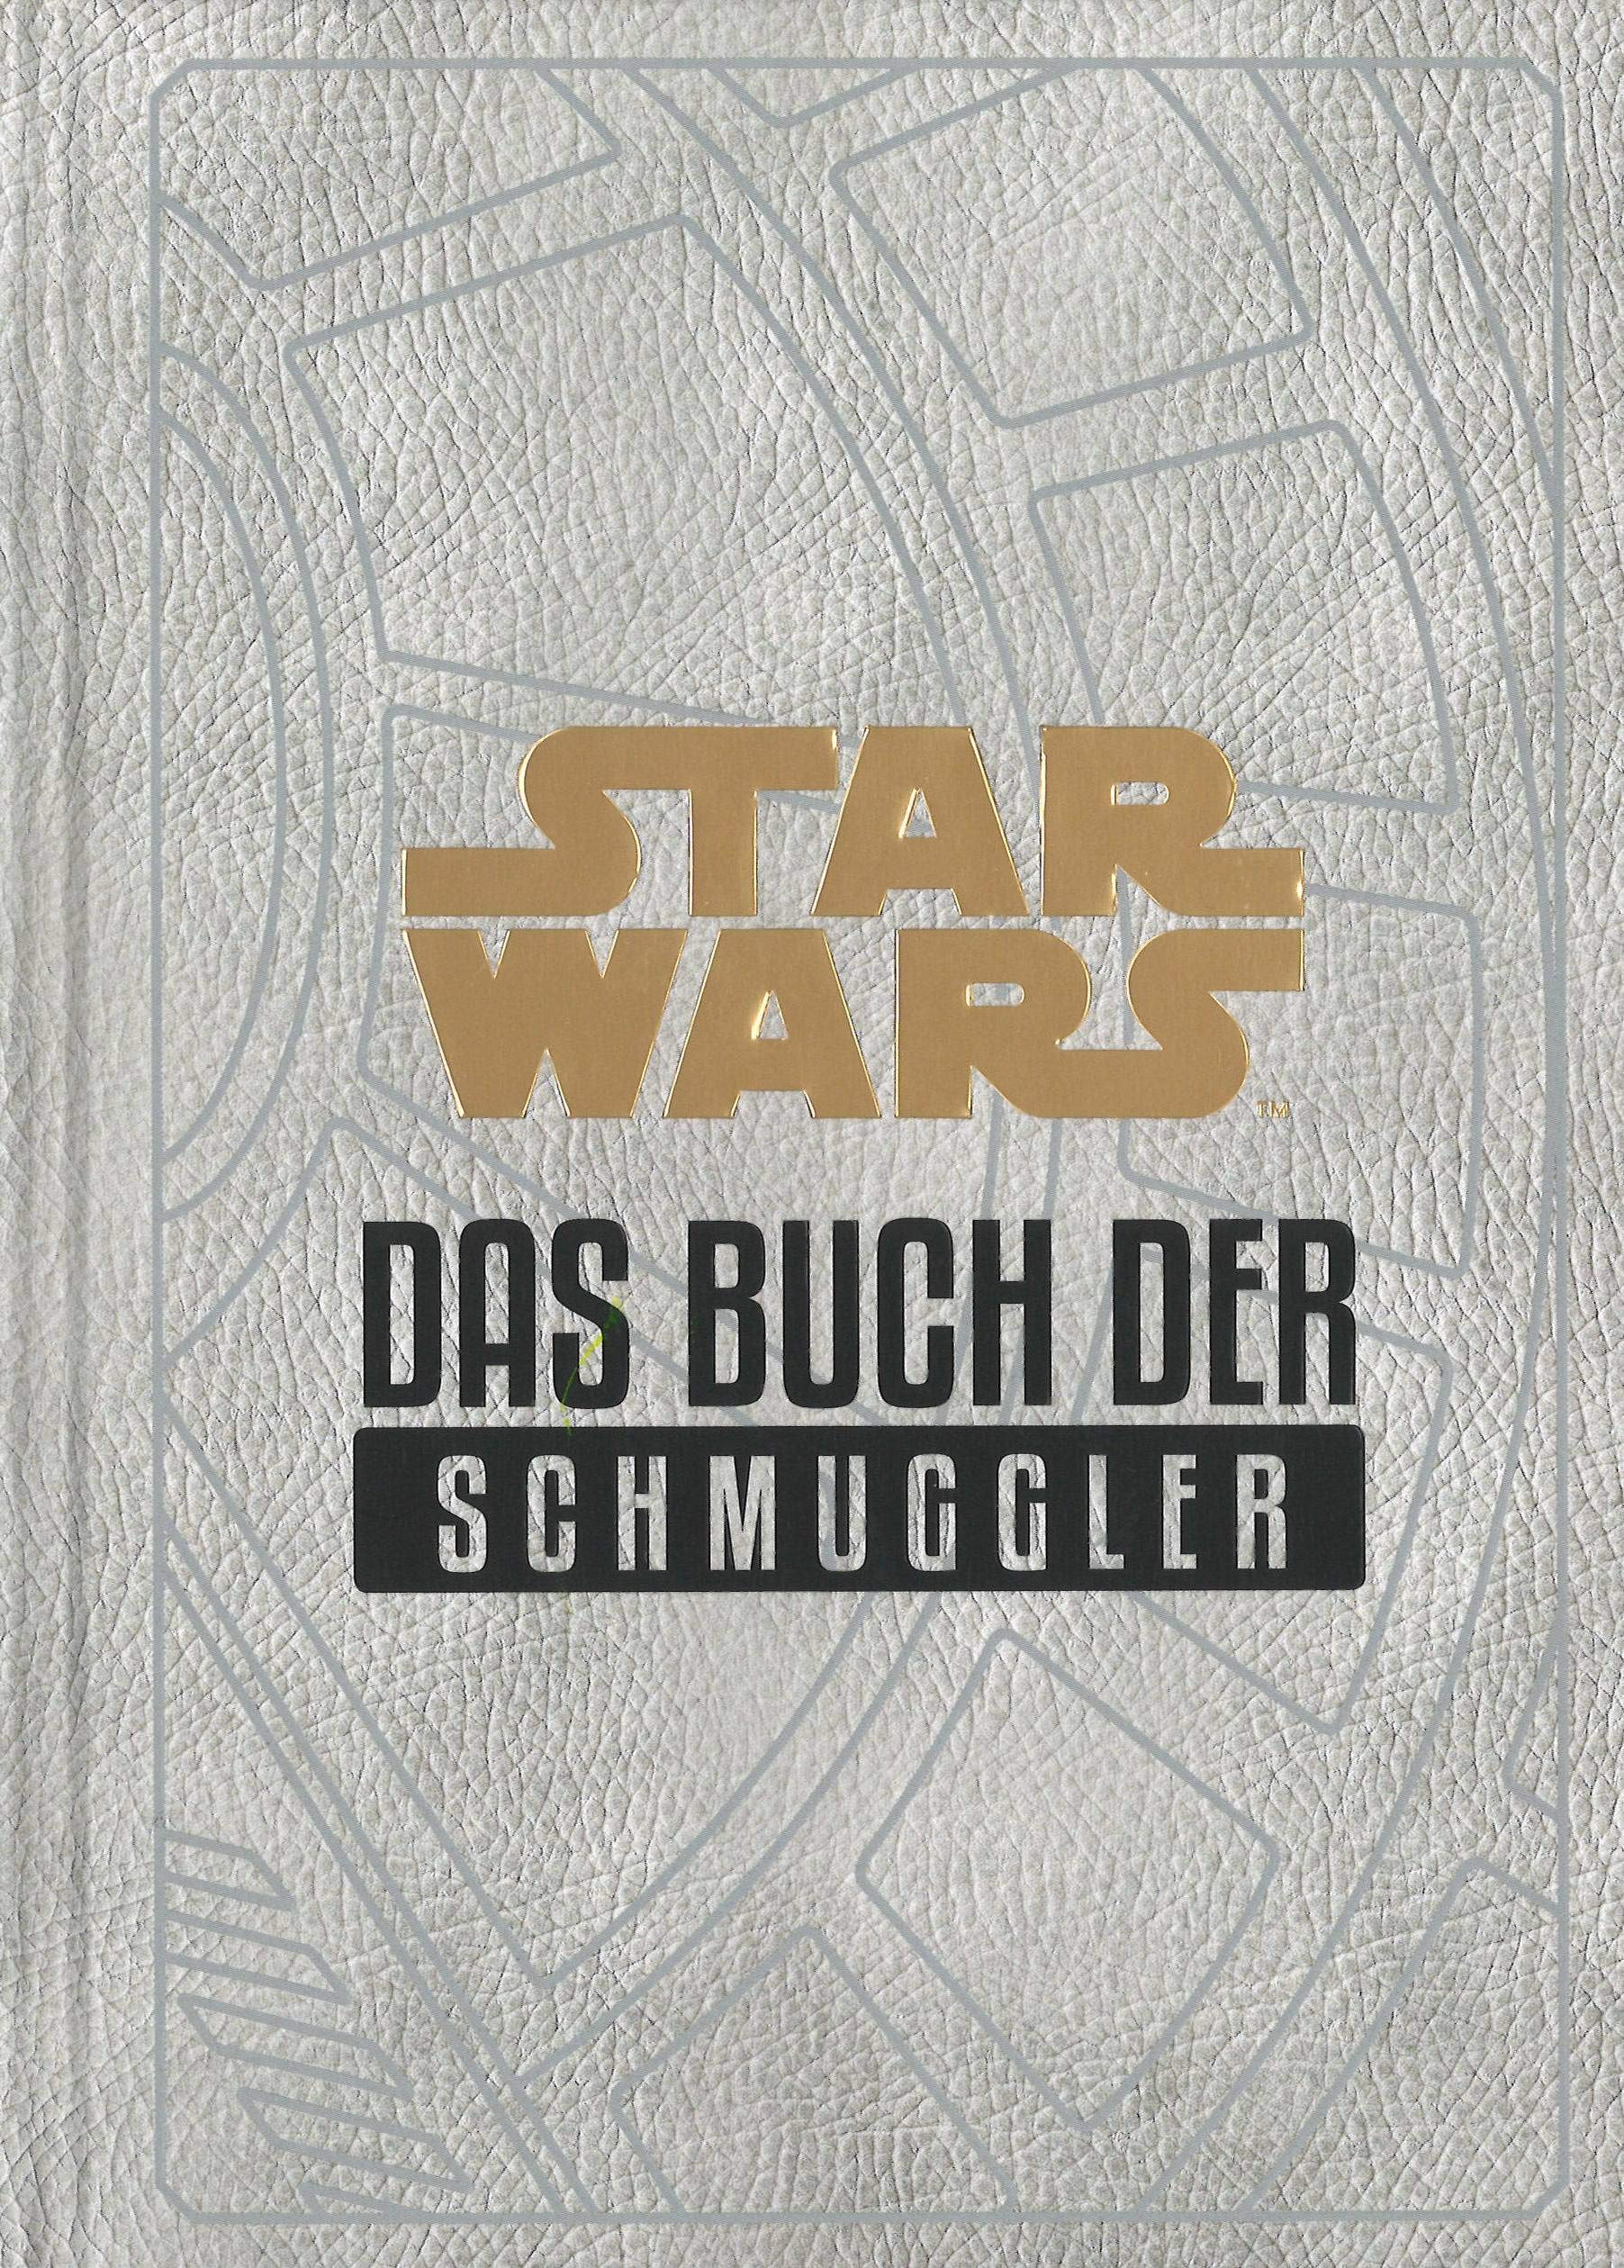 Das Buch der Schmuggler (23.07.2019)